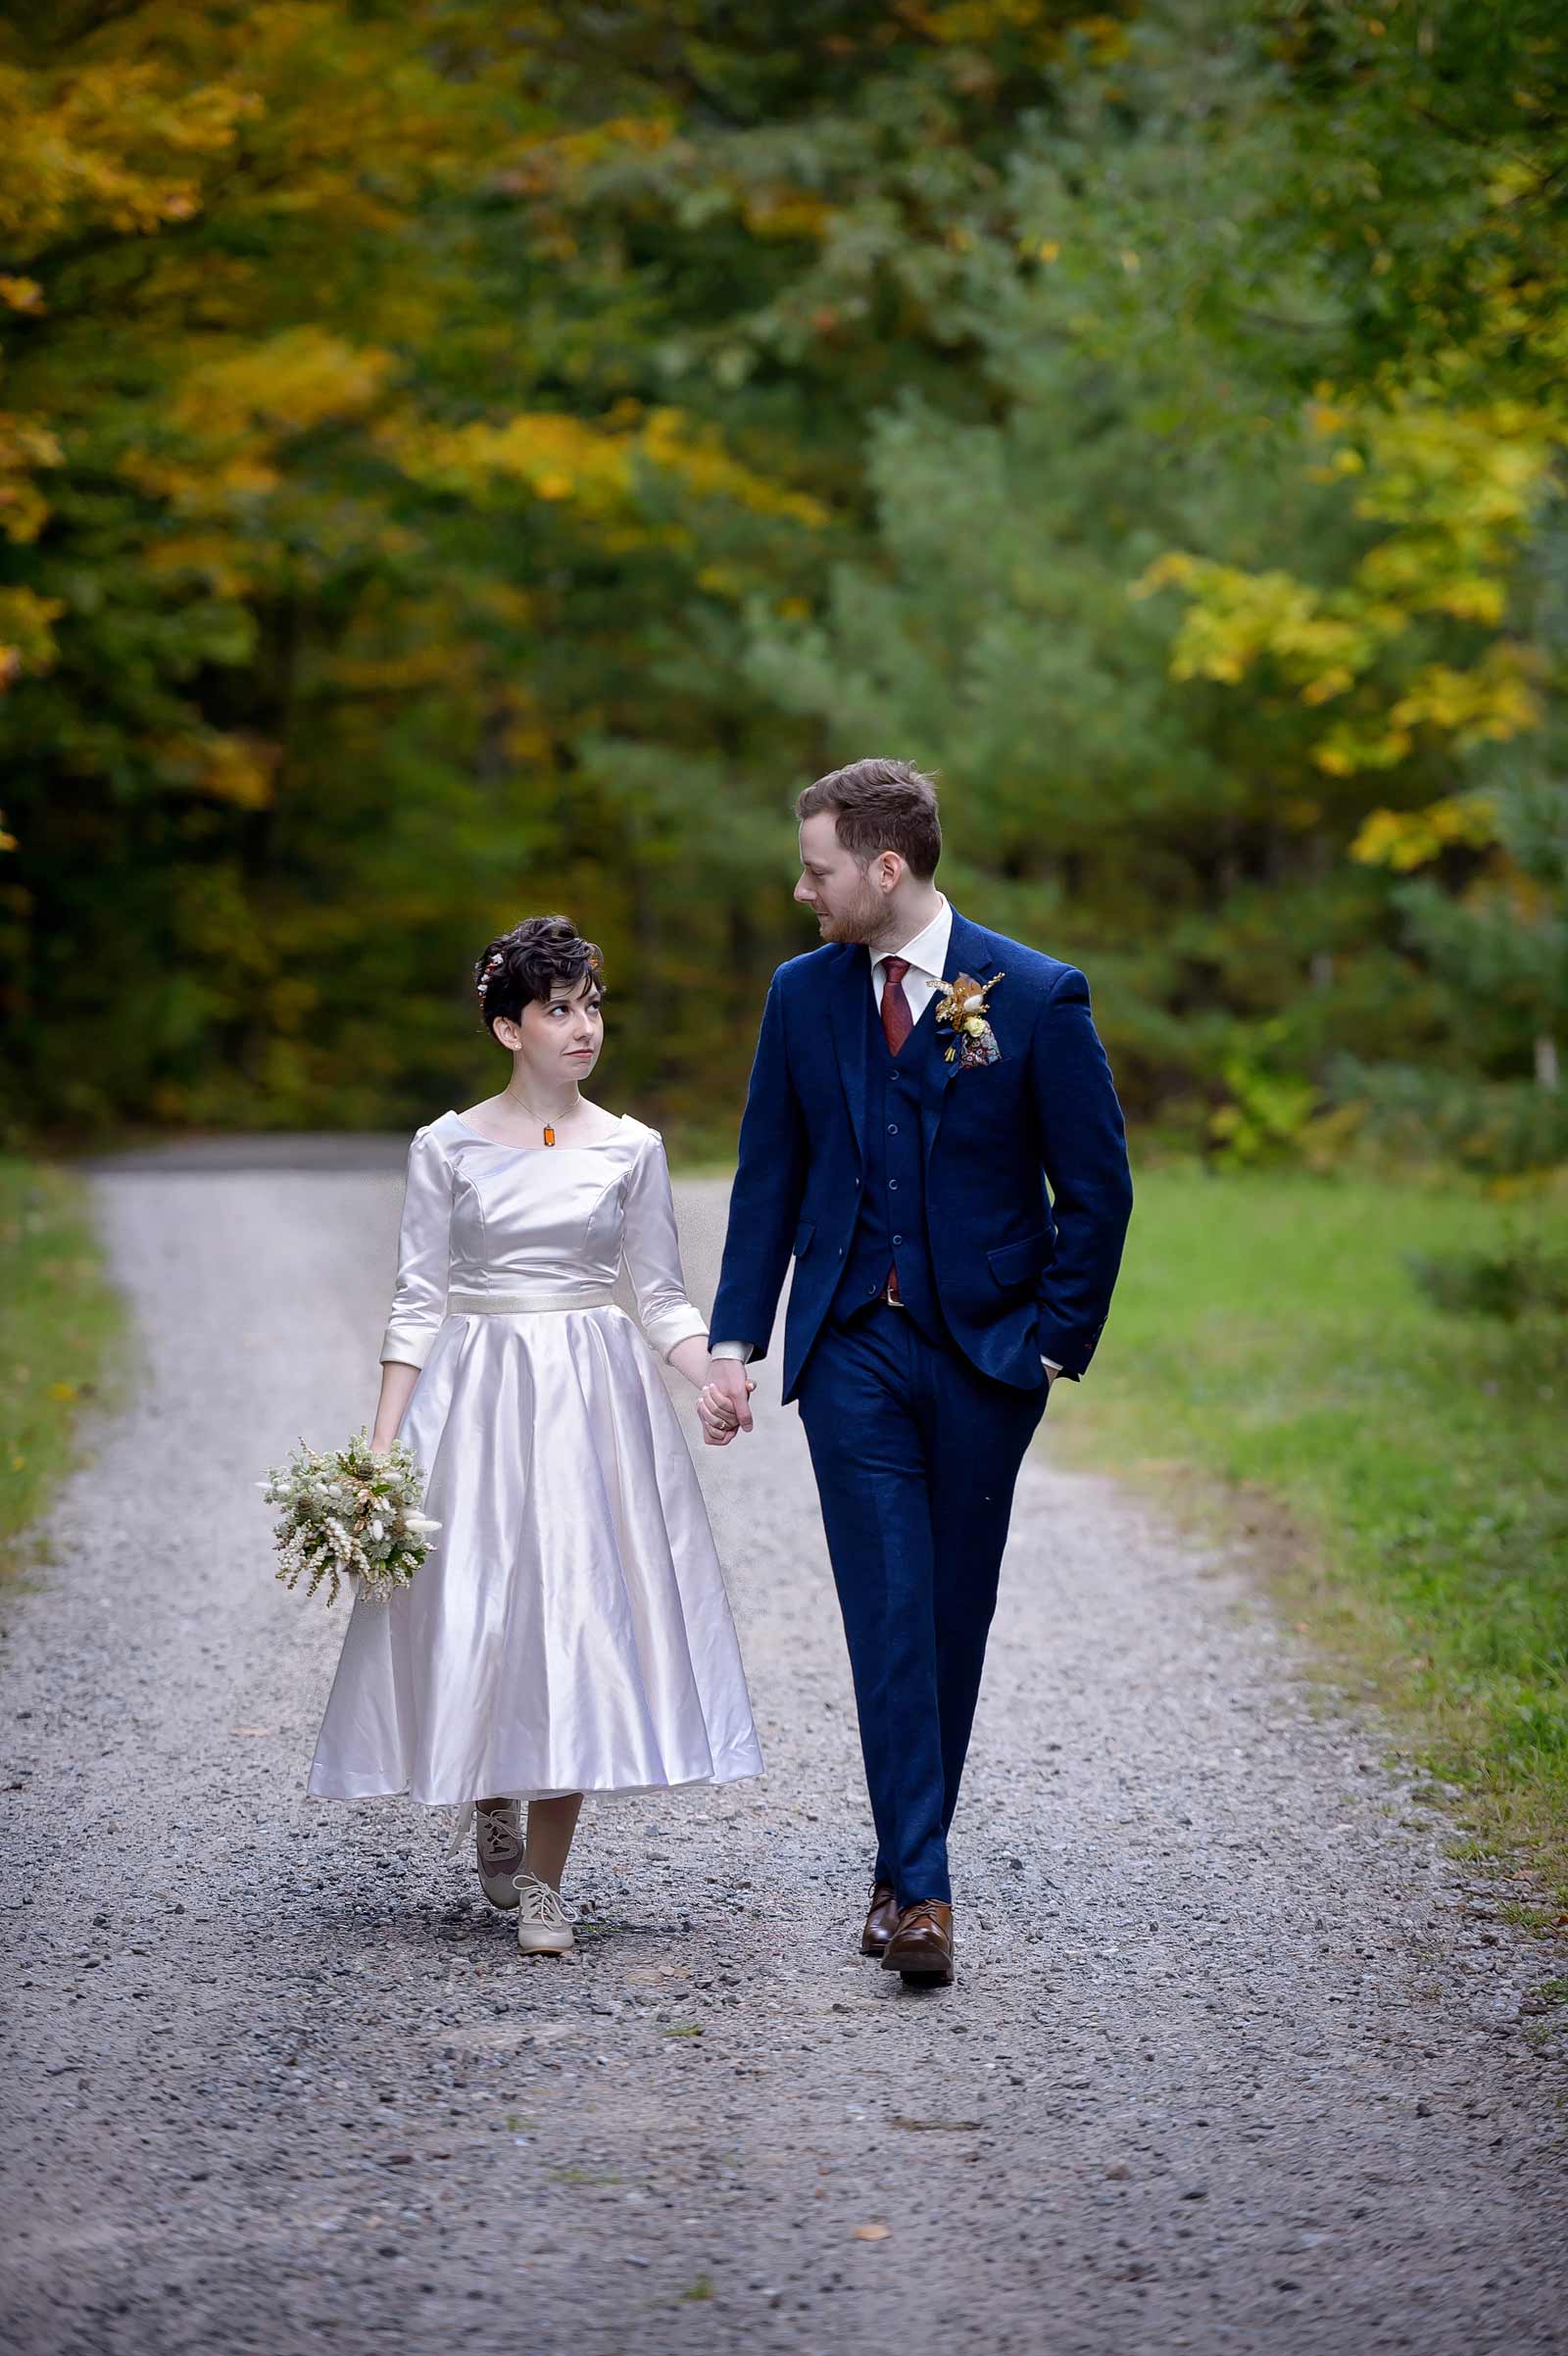 CharlieKieran-wedding-sneakpeek-14